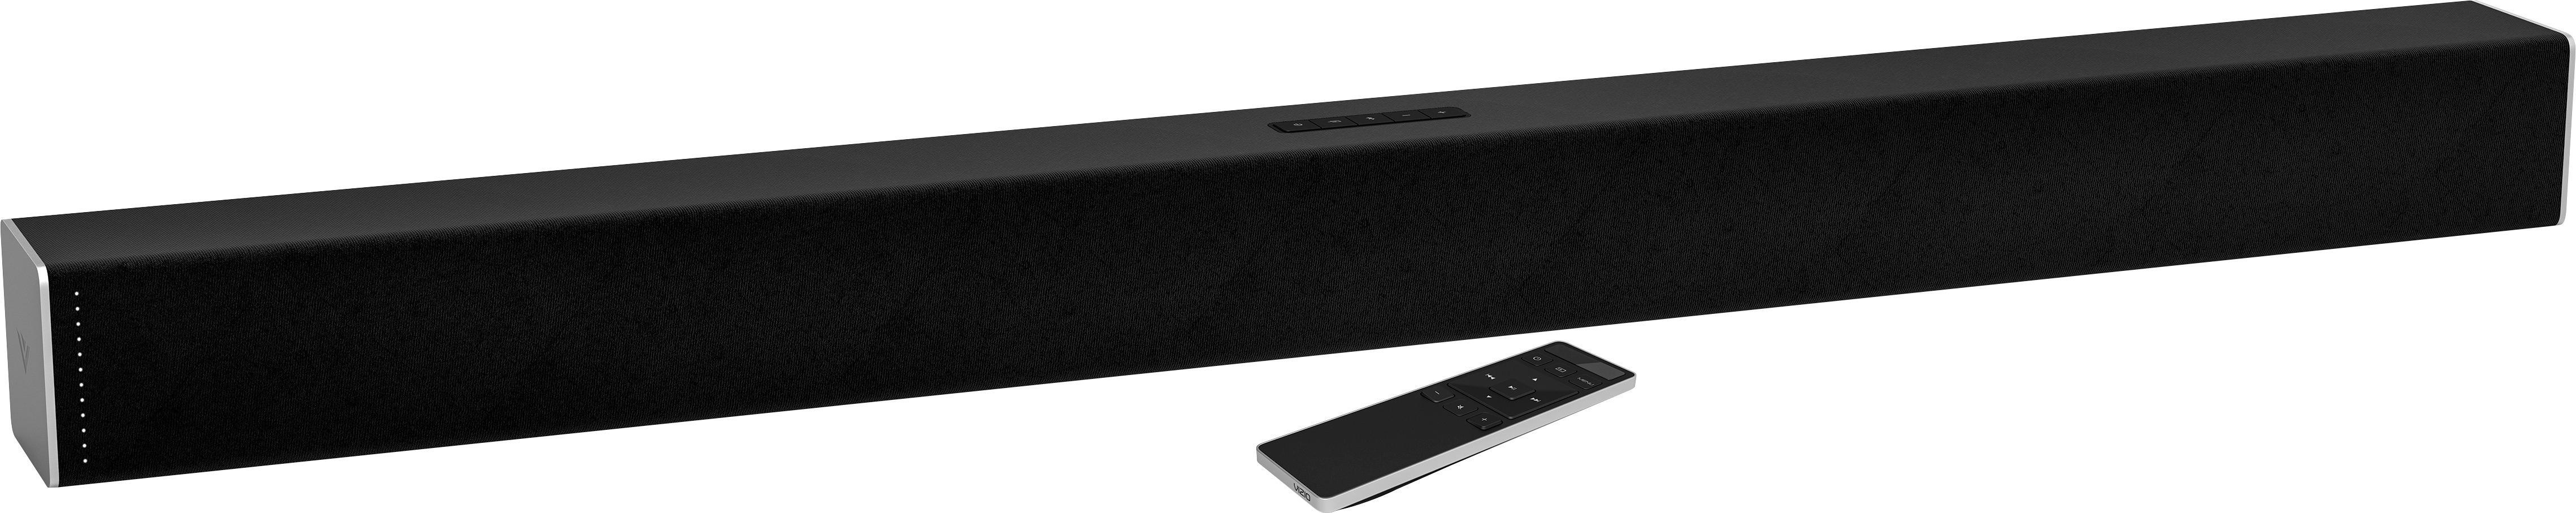 VIZIO - 3.0-Channel Soundbar with Digital Amplifier - Black $99.99